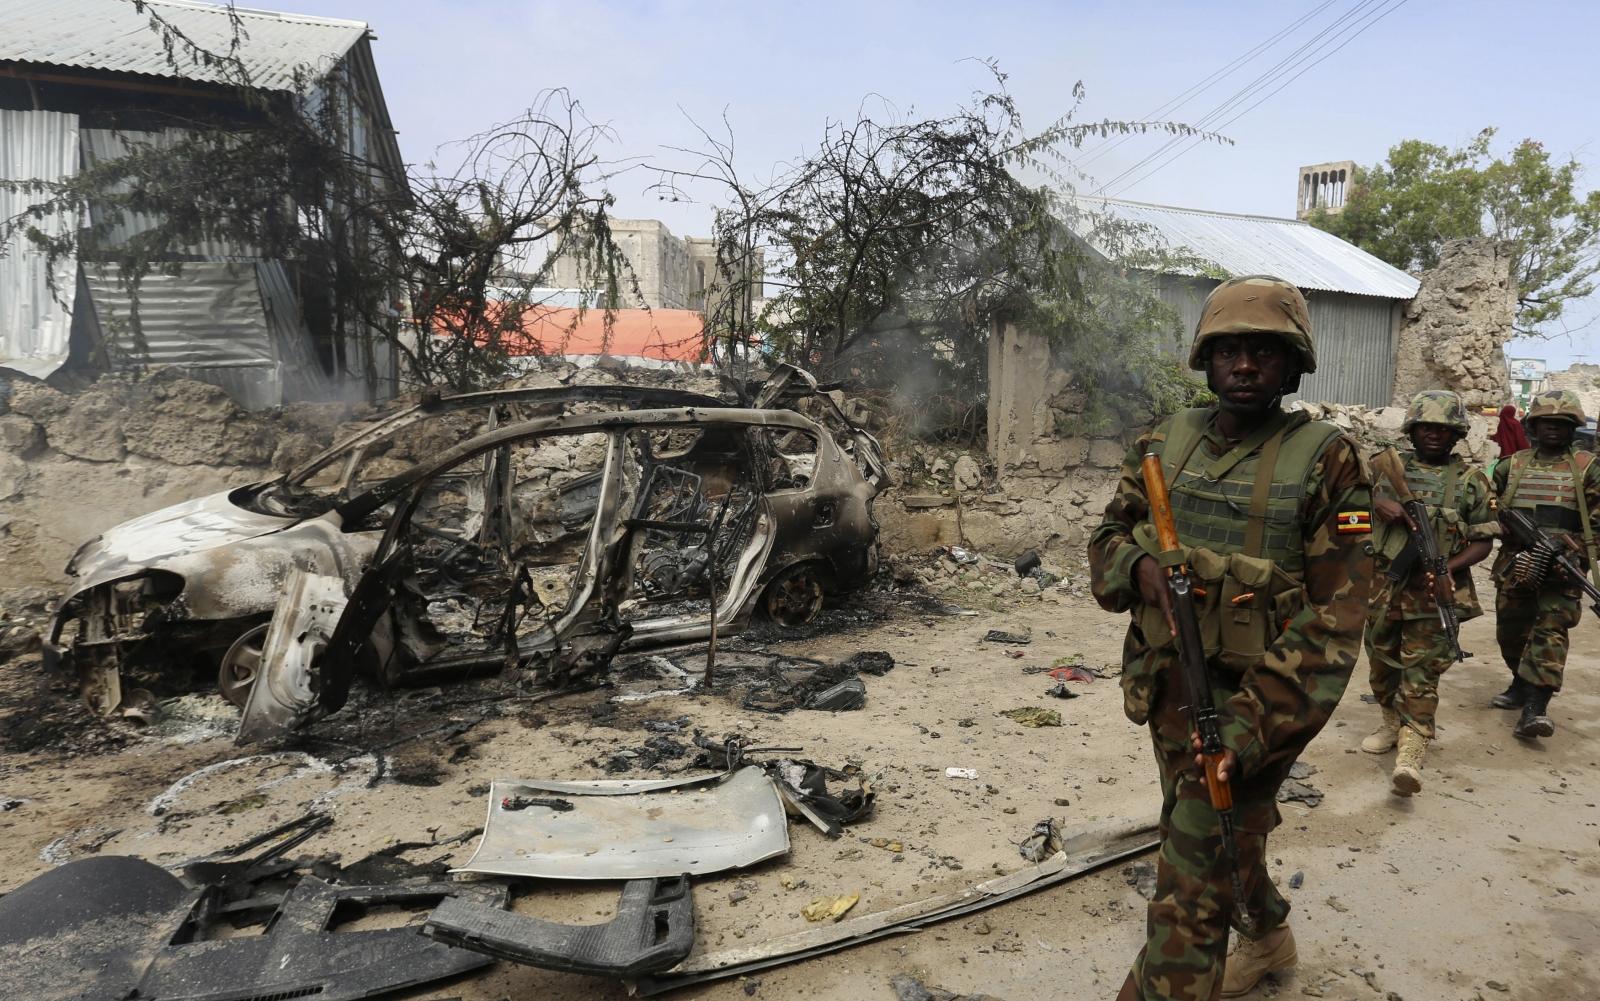 US airstrikes in Somalia against al-Shahab militants